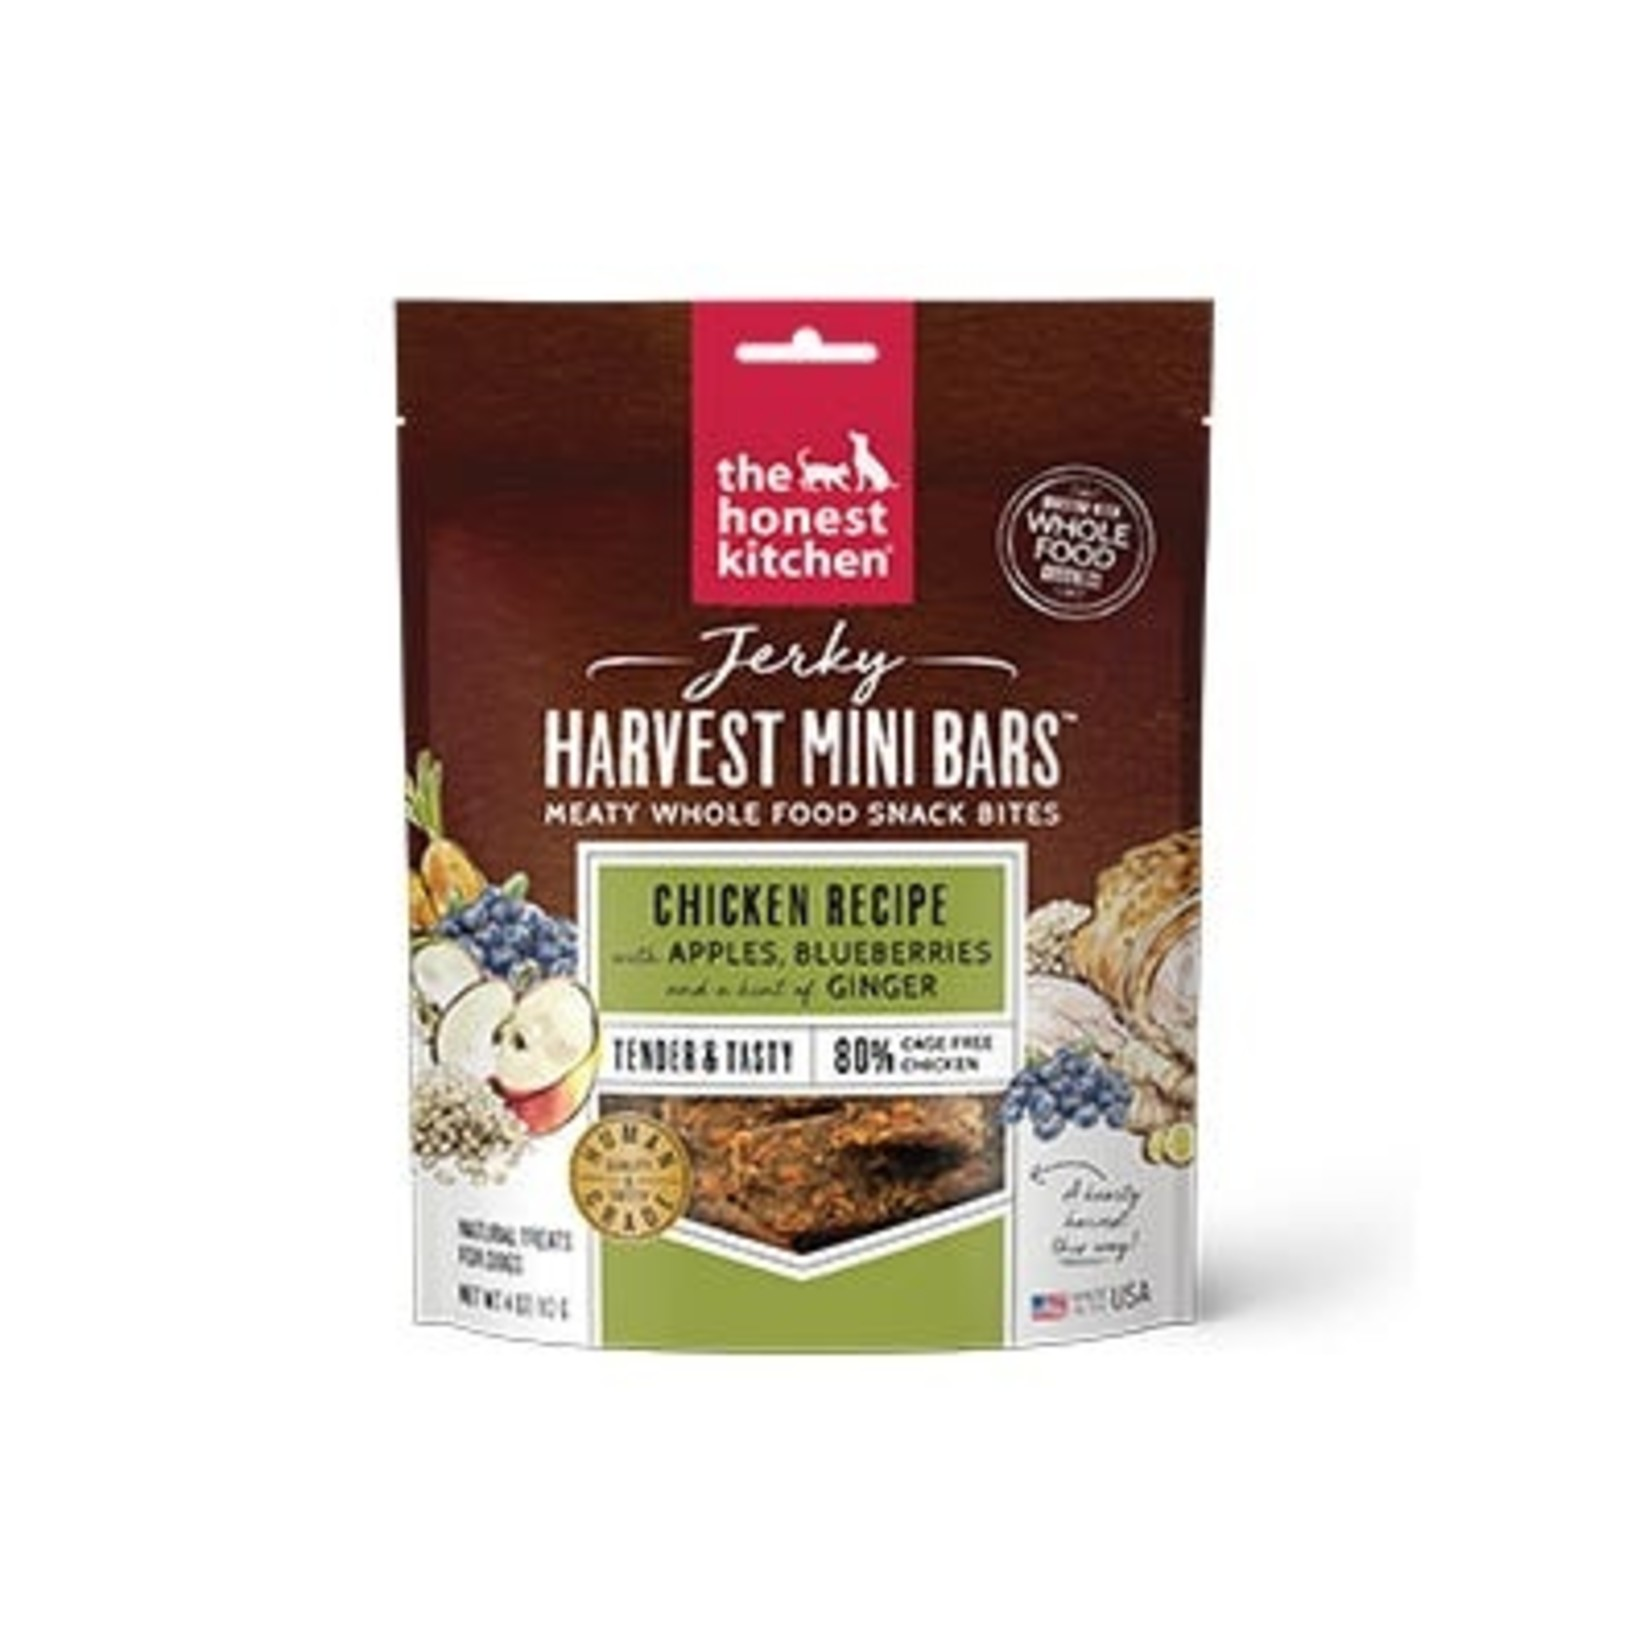 Honest Kitchen The Honest Kitchen Harvest Mini Bars Chicken Jerky Dog Treats 4oz